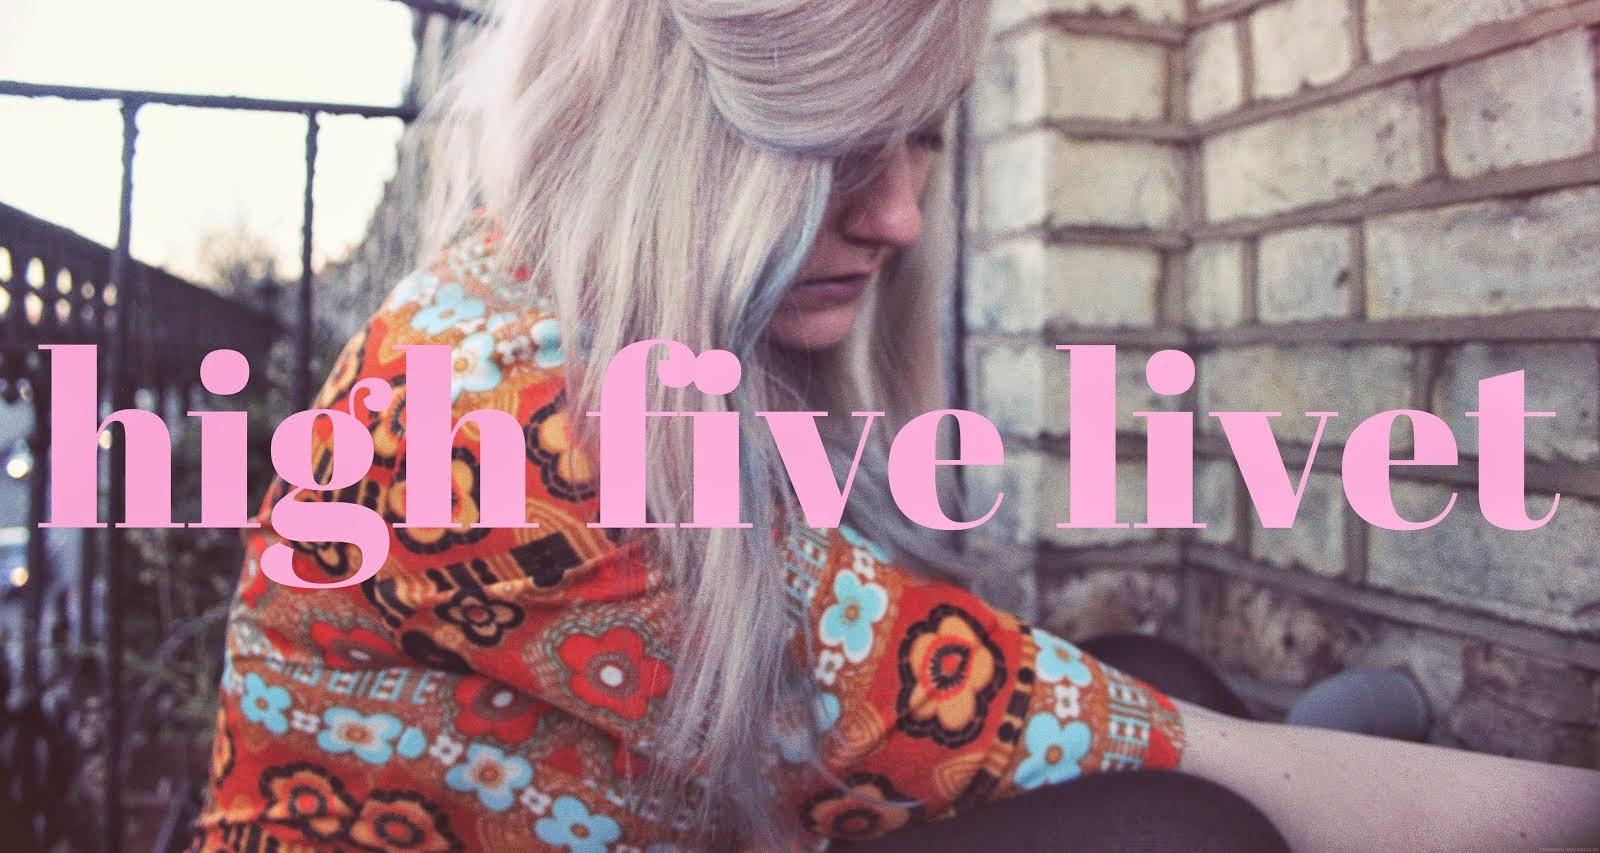 high five livet